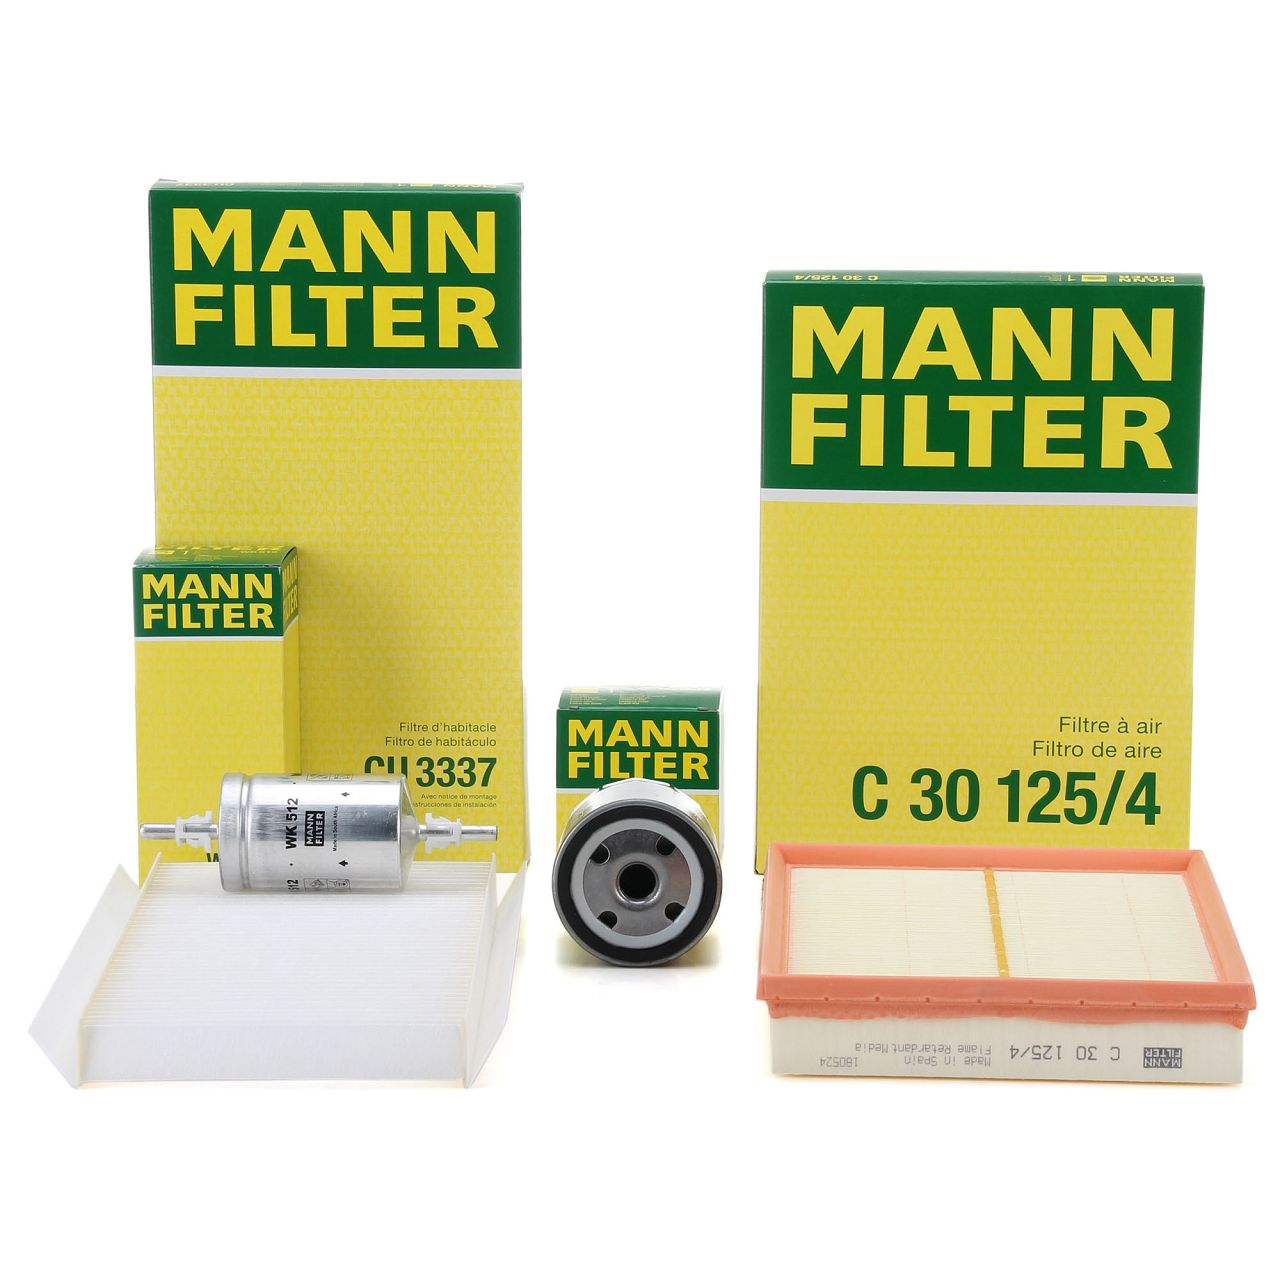 MANN Inspektionskit für OPEL COMBO 1.6 / 1.6 CNG CORSA C 1.4 1.8 TIGRA B 1.8